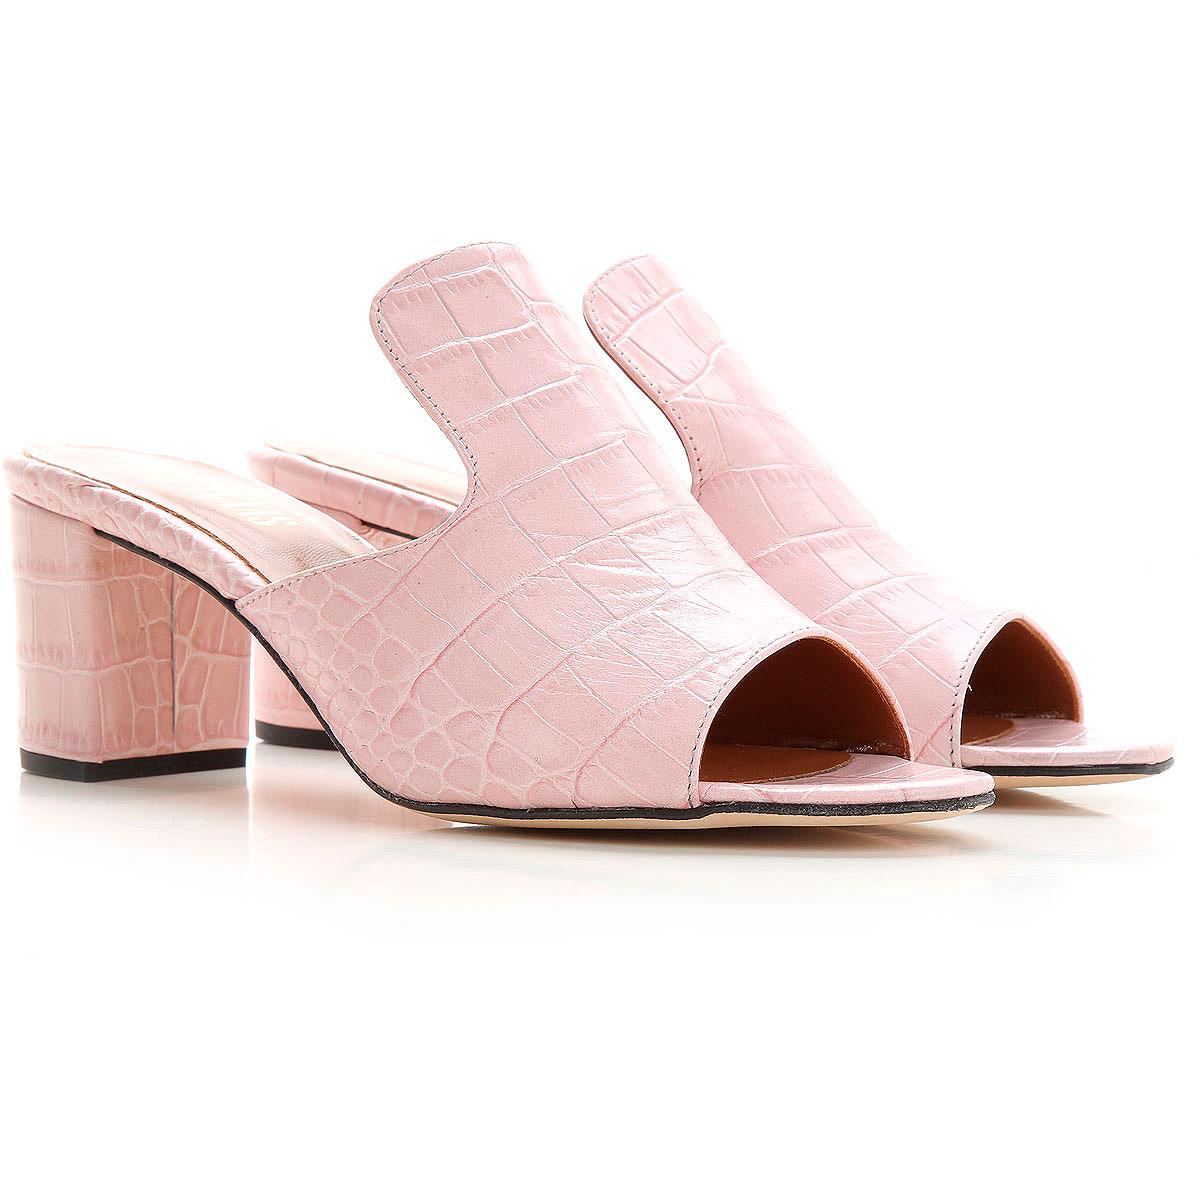 Paris Texas Sandale Femme, Rose, Cuir, 2019, 37 39